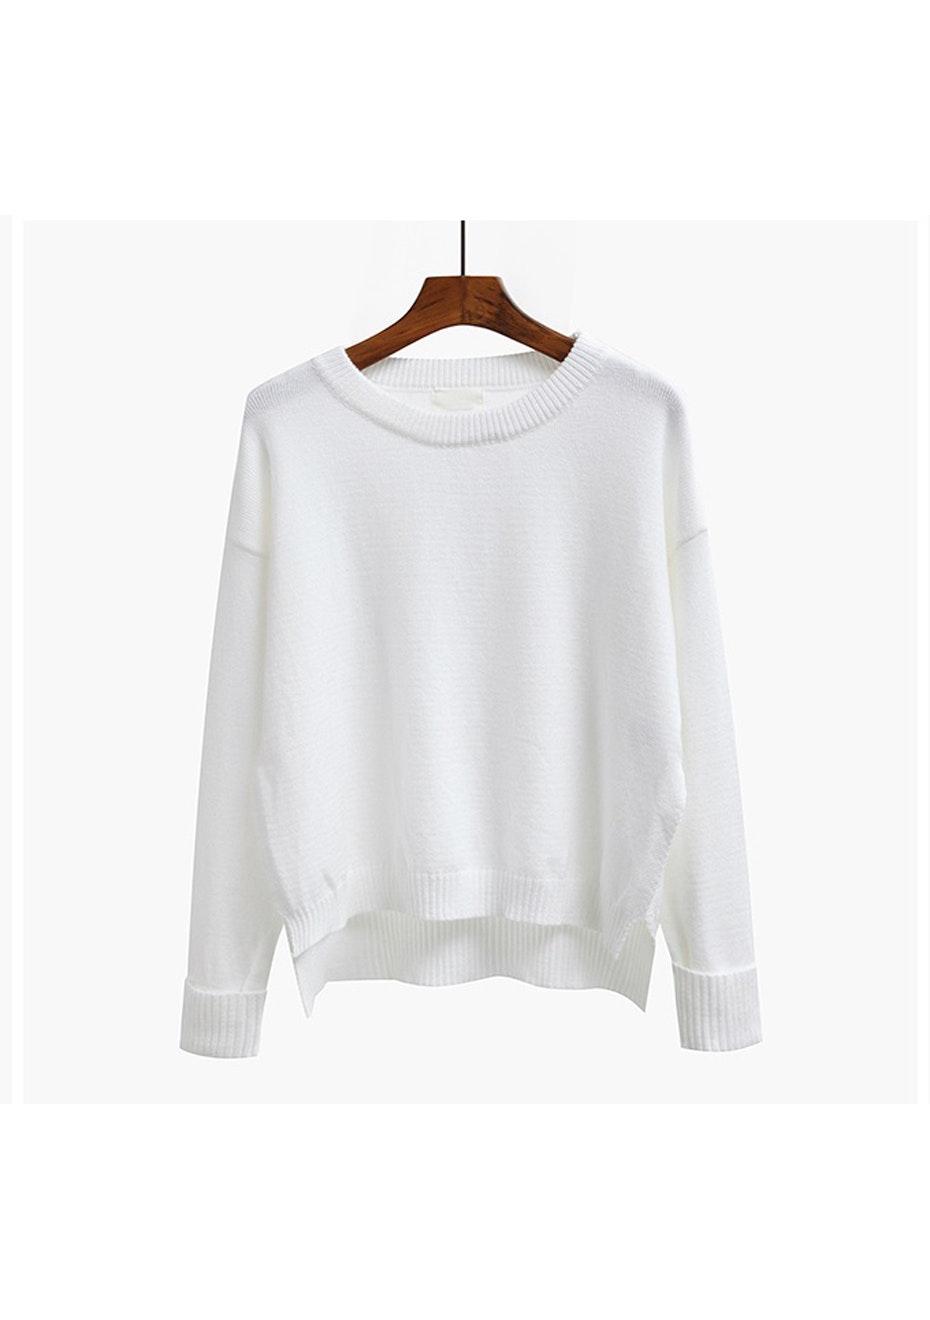 Mimi  Light Weight Sweater - White